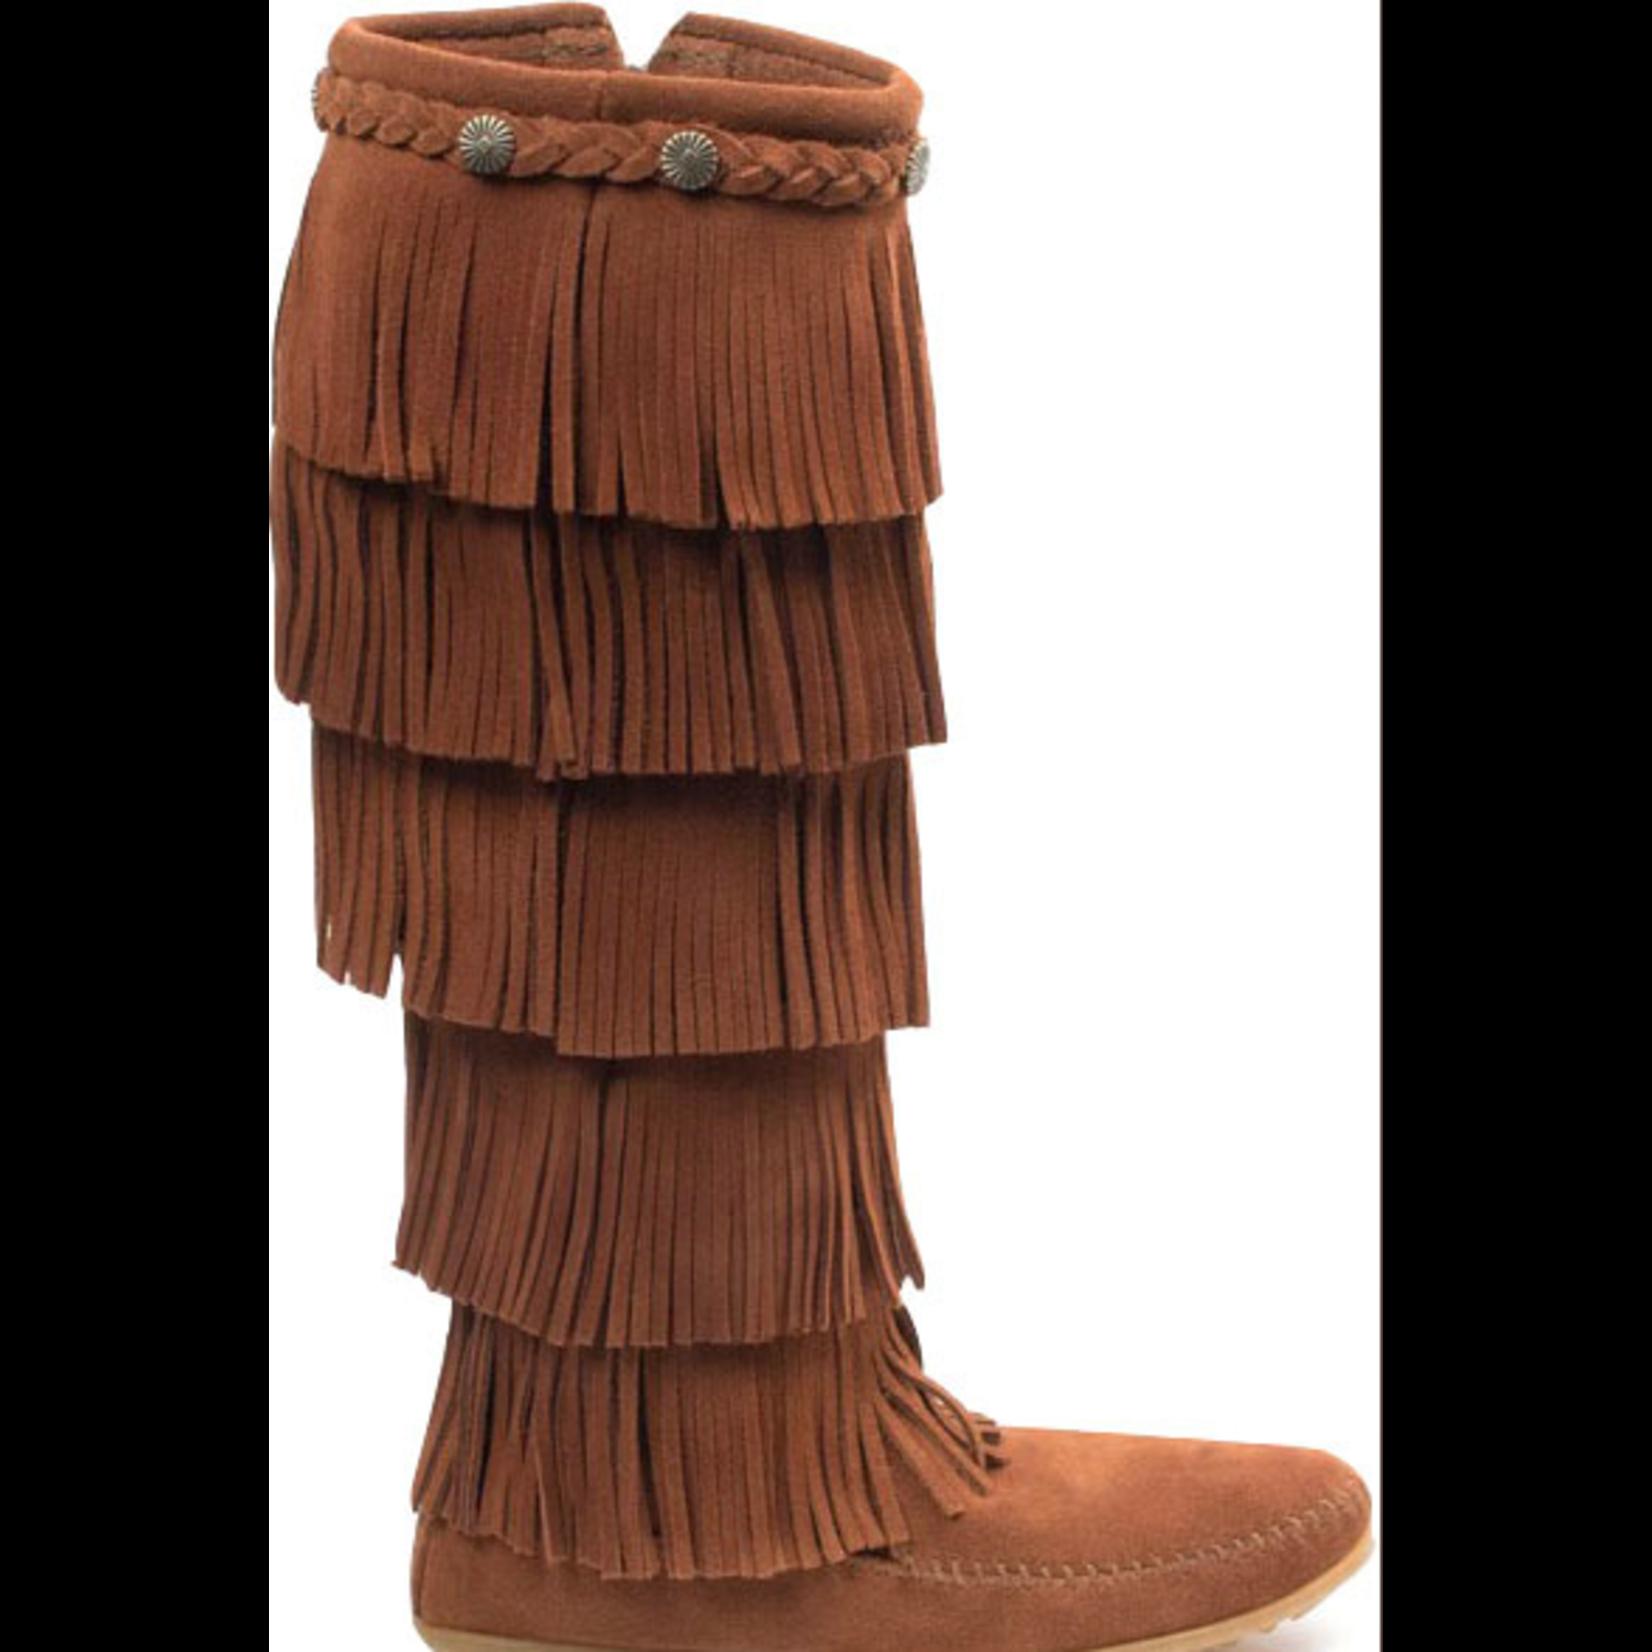 Minnetonka Women's Minnetonka 5 Layer Fringe Boot Brown 1652